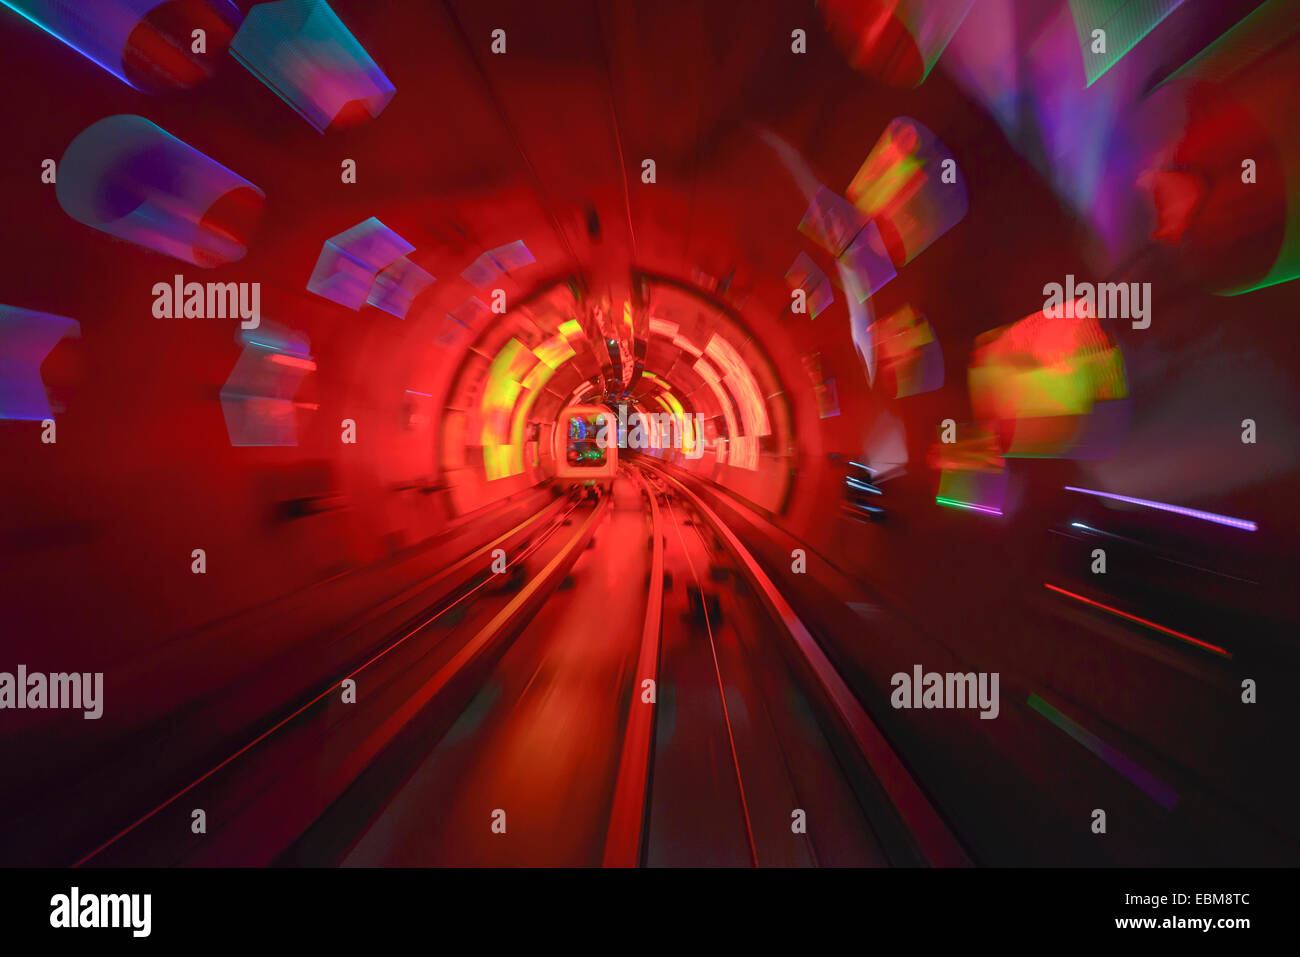 Bewegungsunschärfe im Shanghai Sightseeing Tunnel. Stockbild